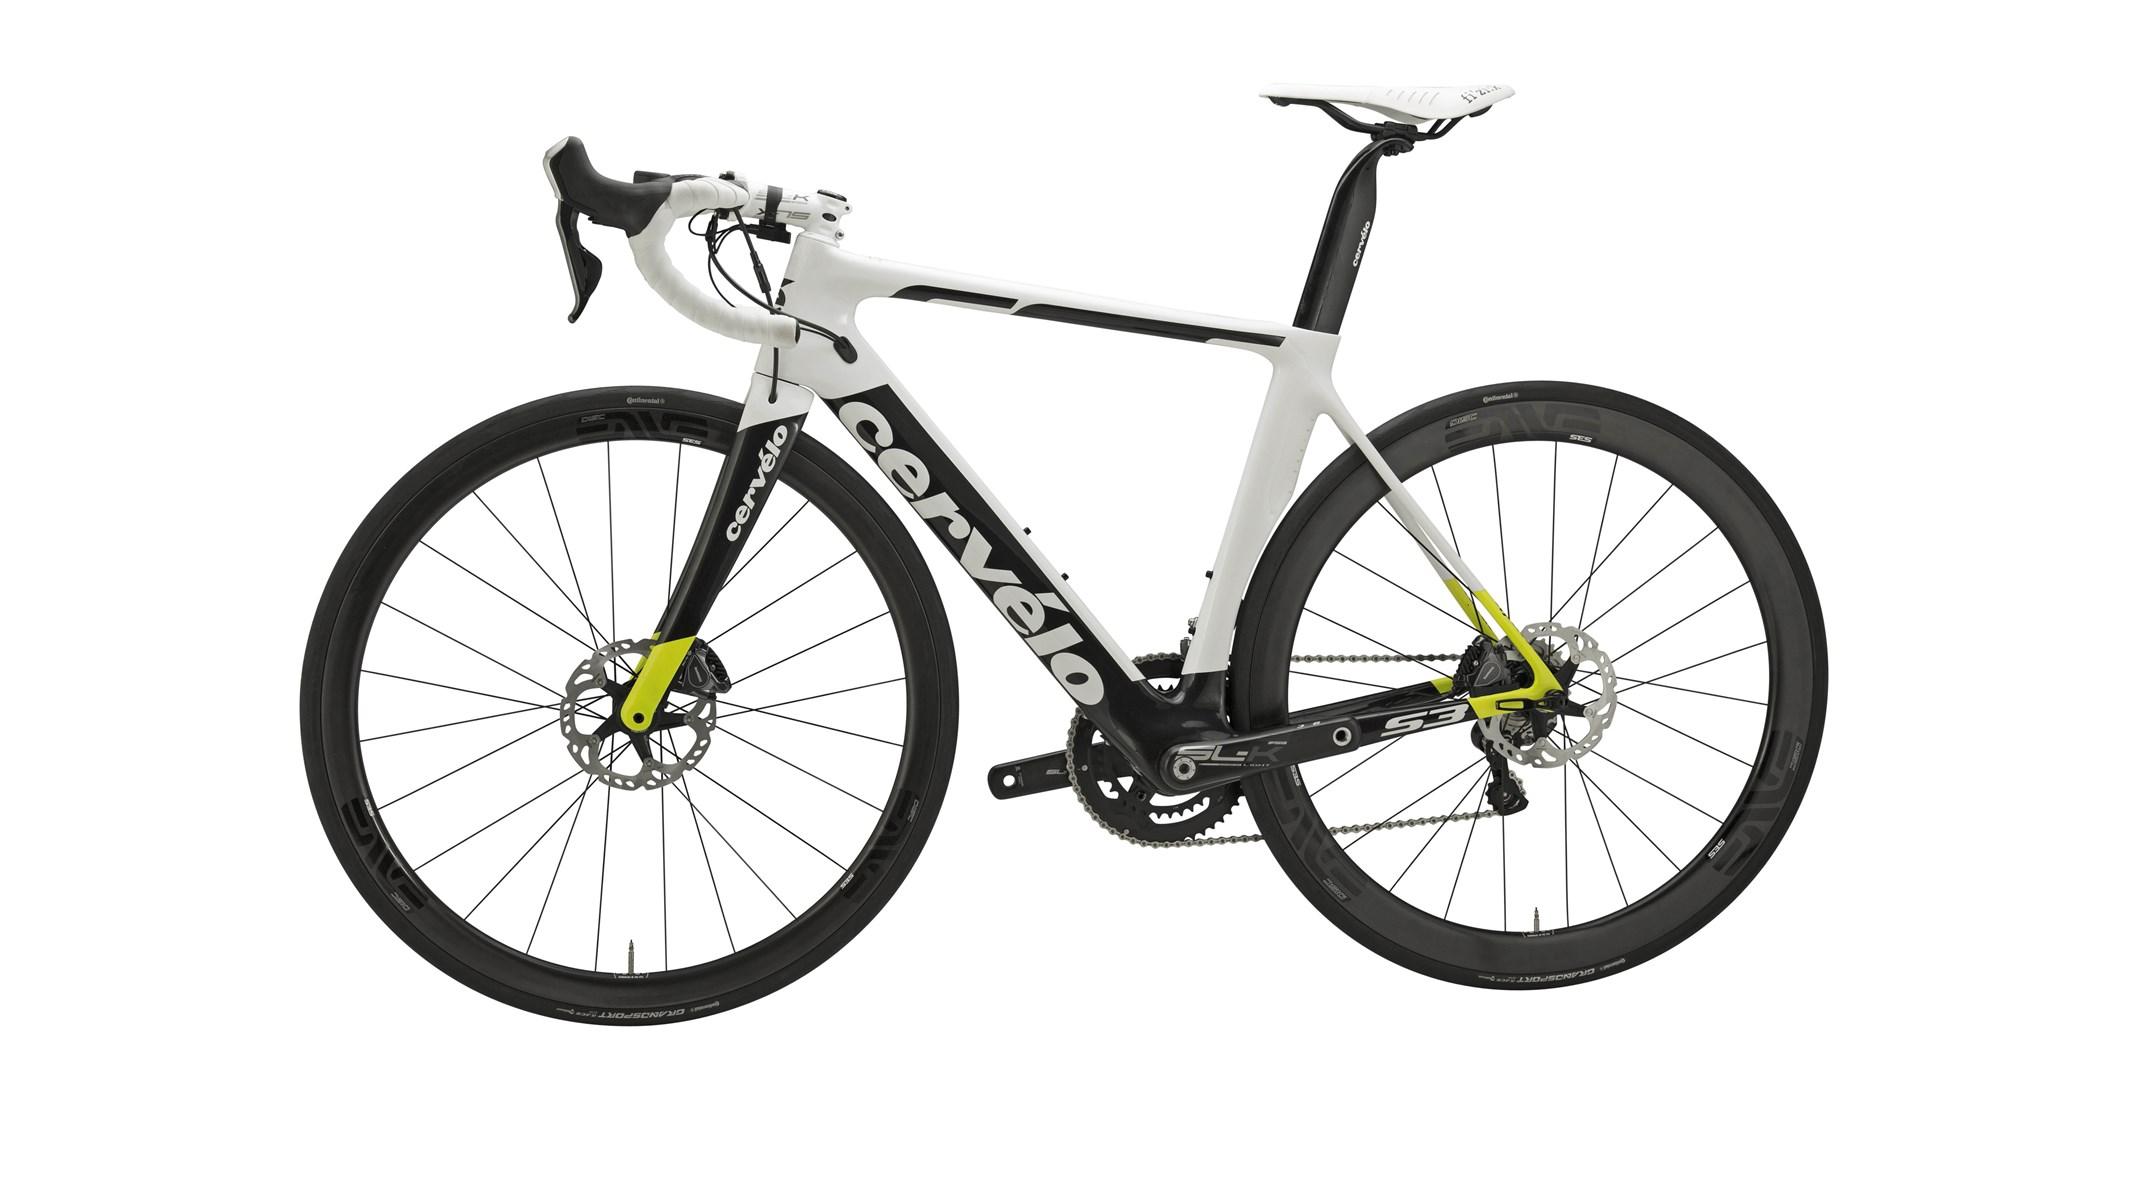 3c7127fab Cervelo S3 Disc Ultegra Di2 8070 2018 Road Bike - White £5